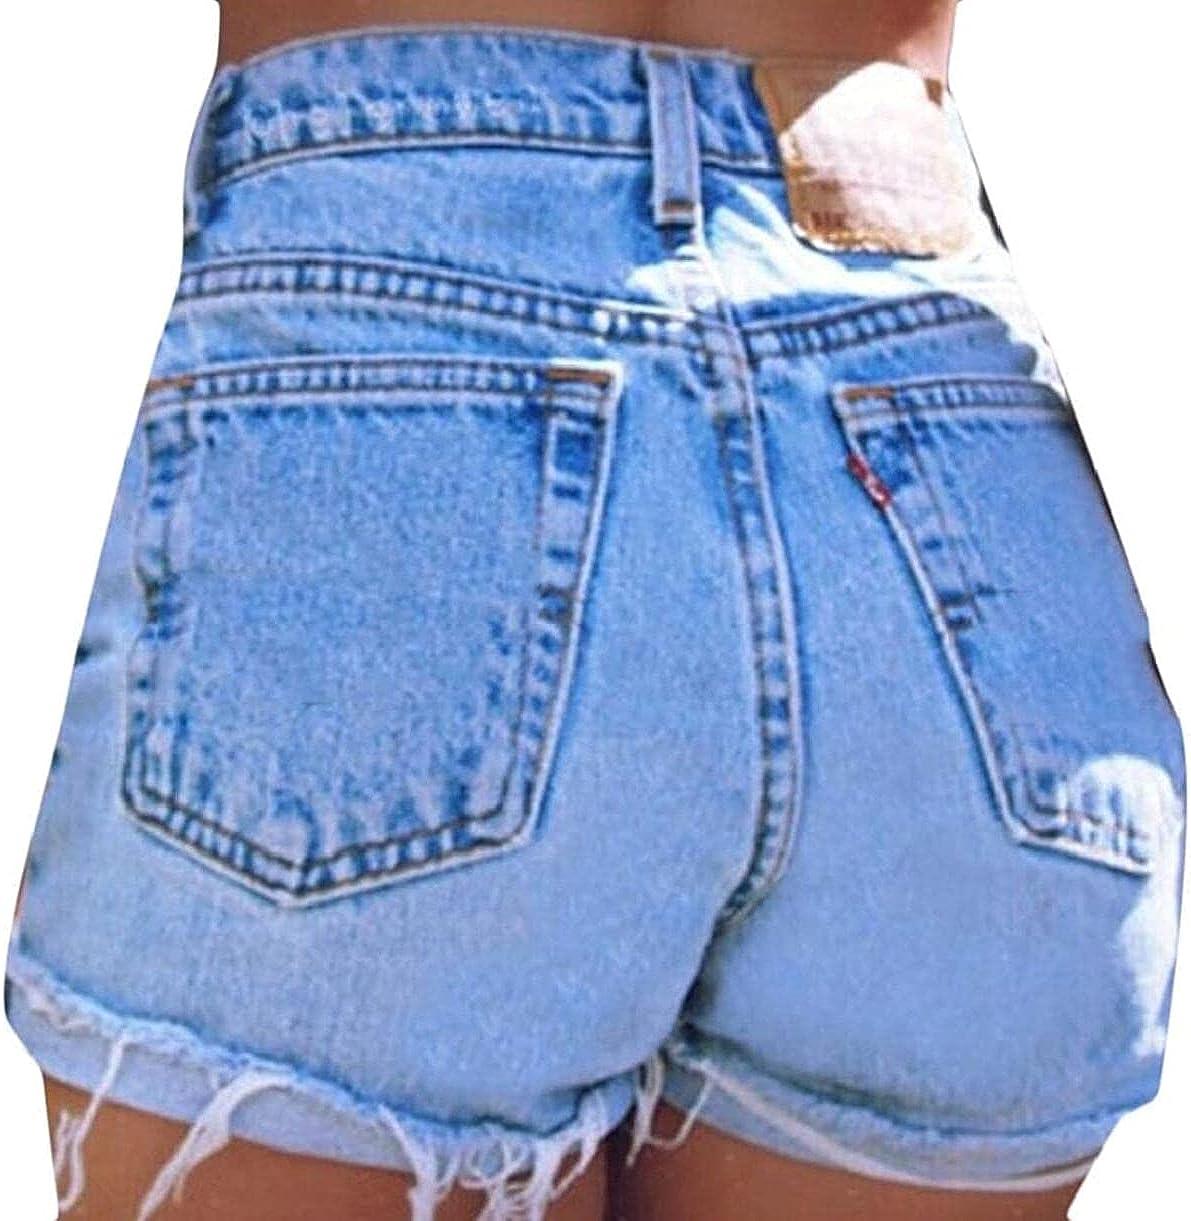 ZYUEER Denim Shorts for Womens,Slim Fit High Waist Washed Denim Shorts Jeans